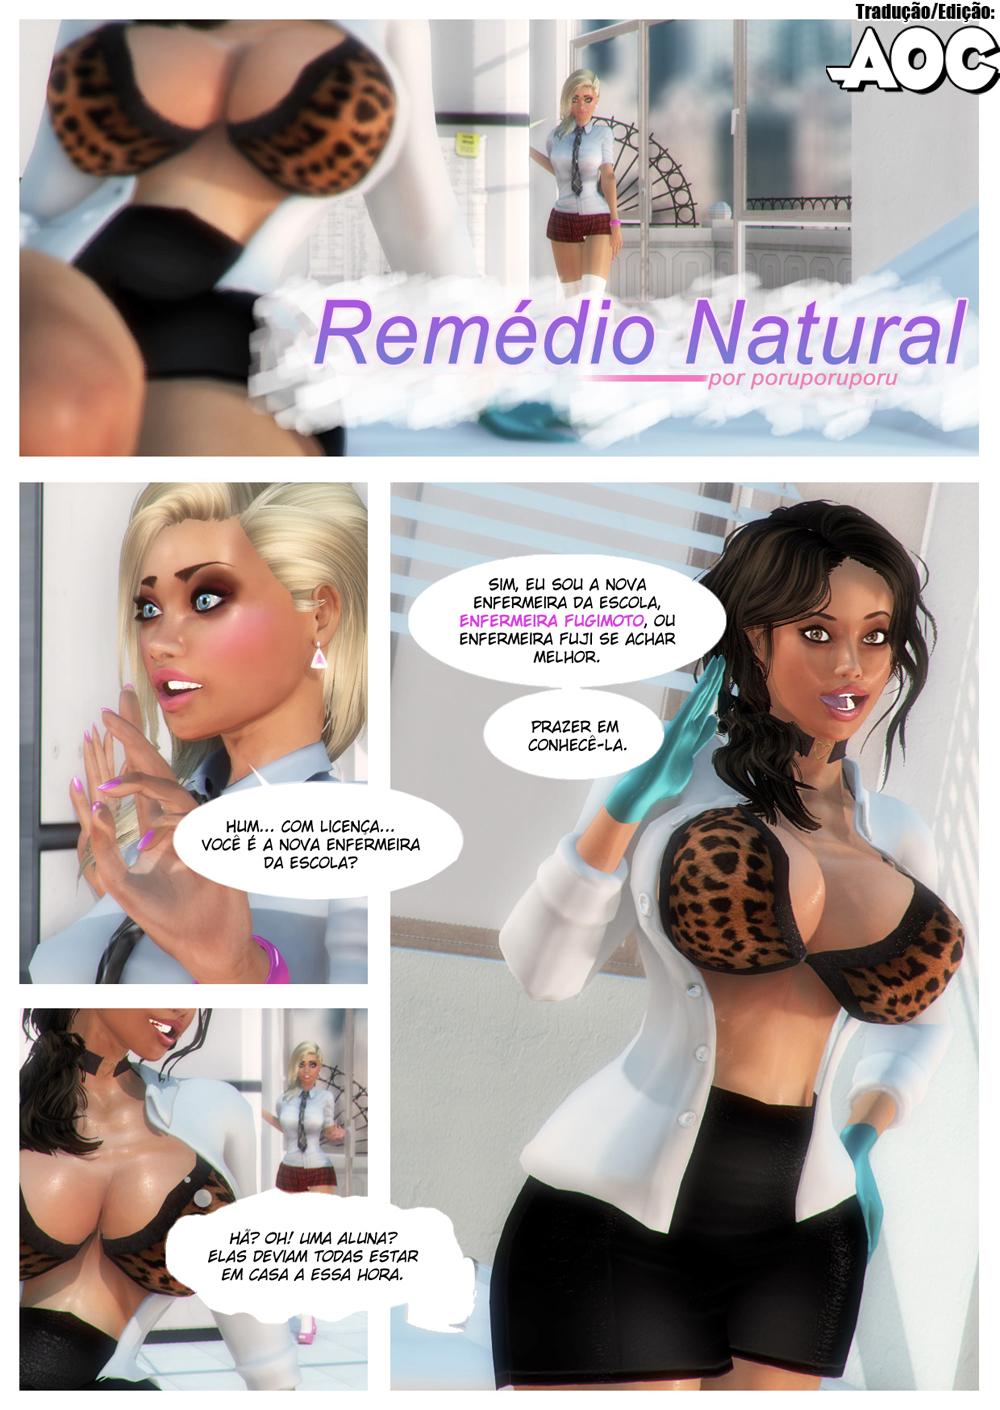 Remédio natural